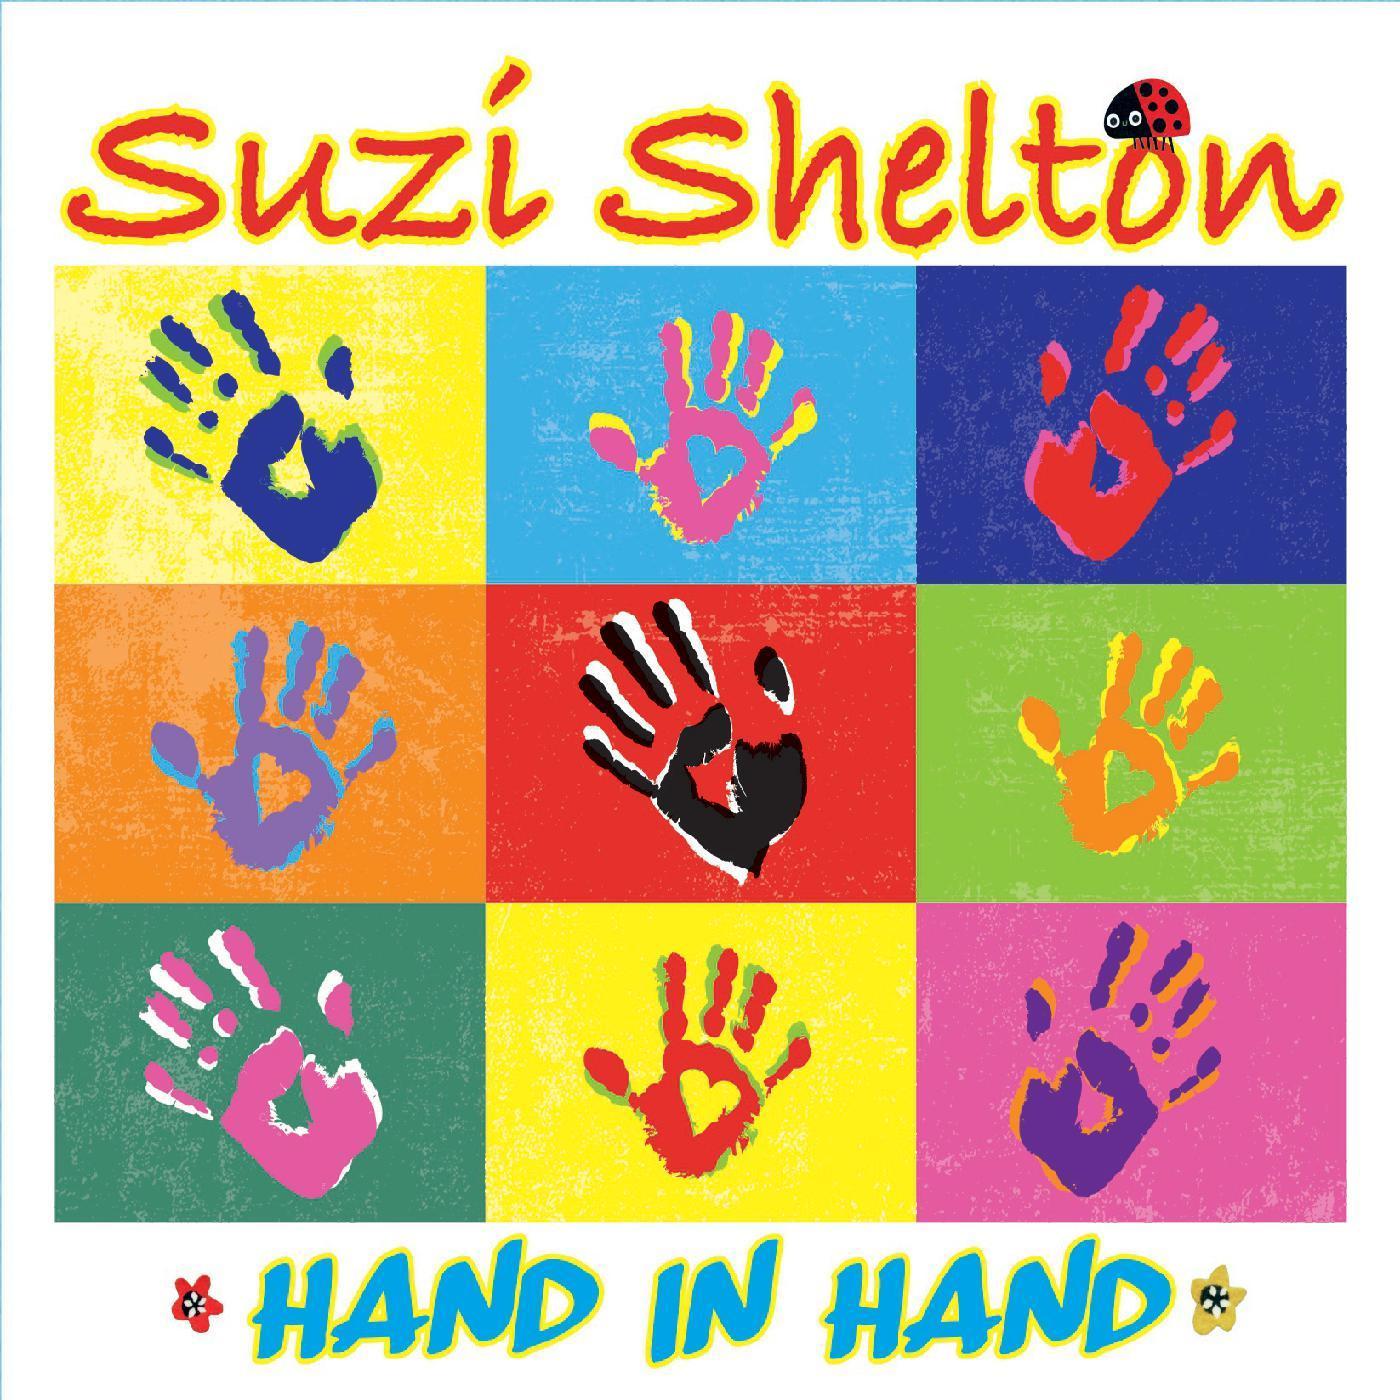 Suzi Shelton Hand in Hand CD cover artwork